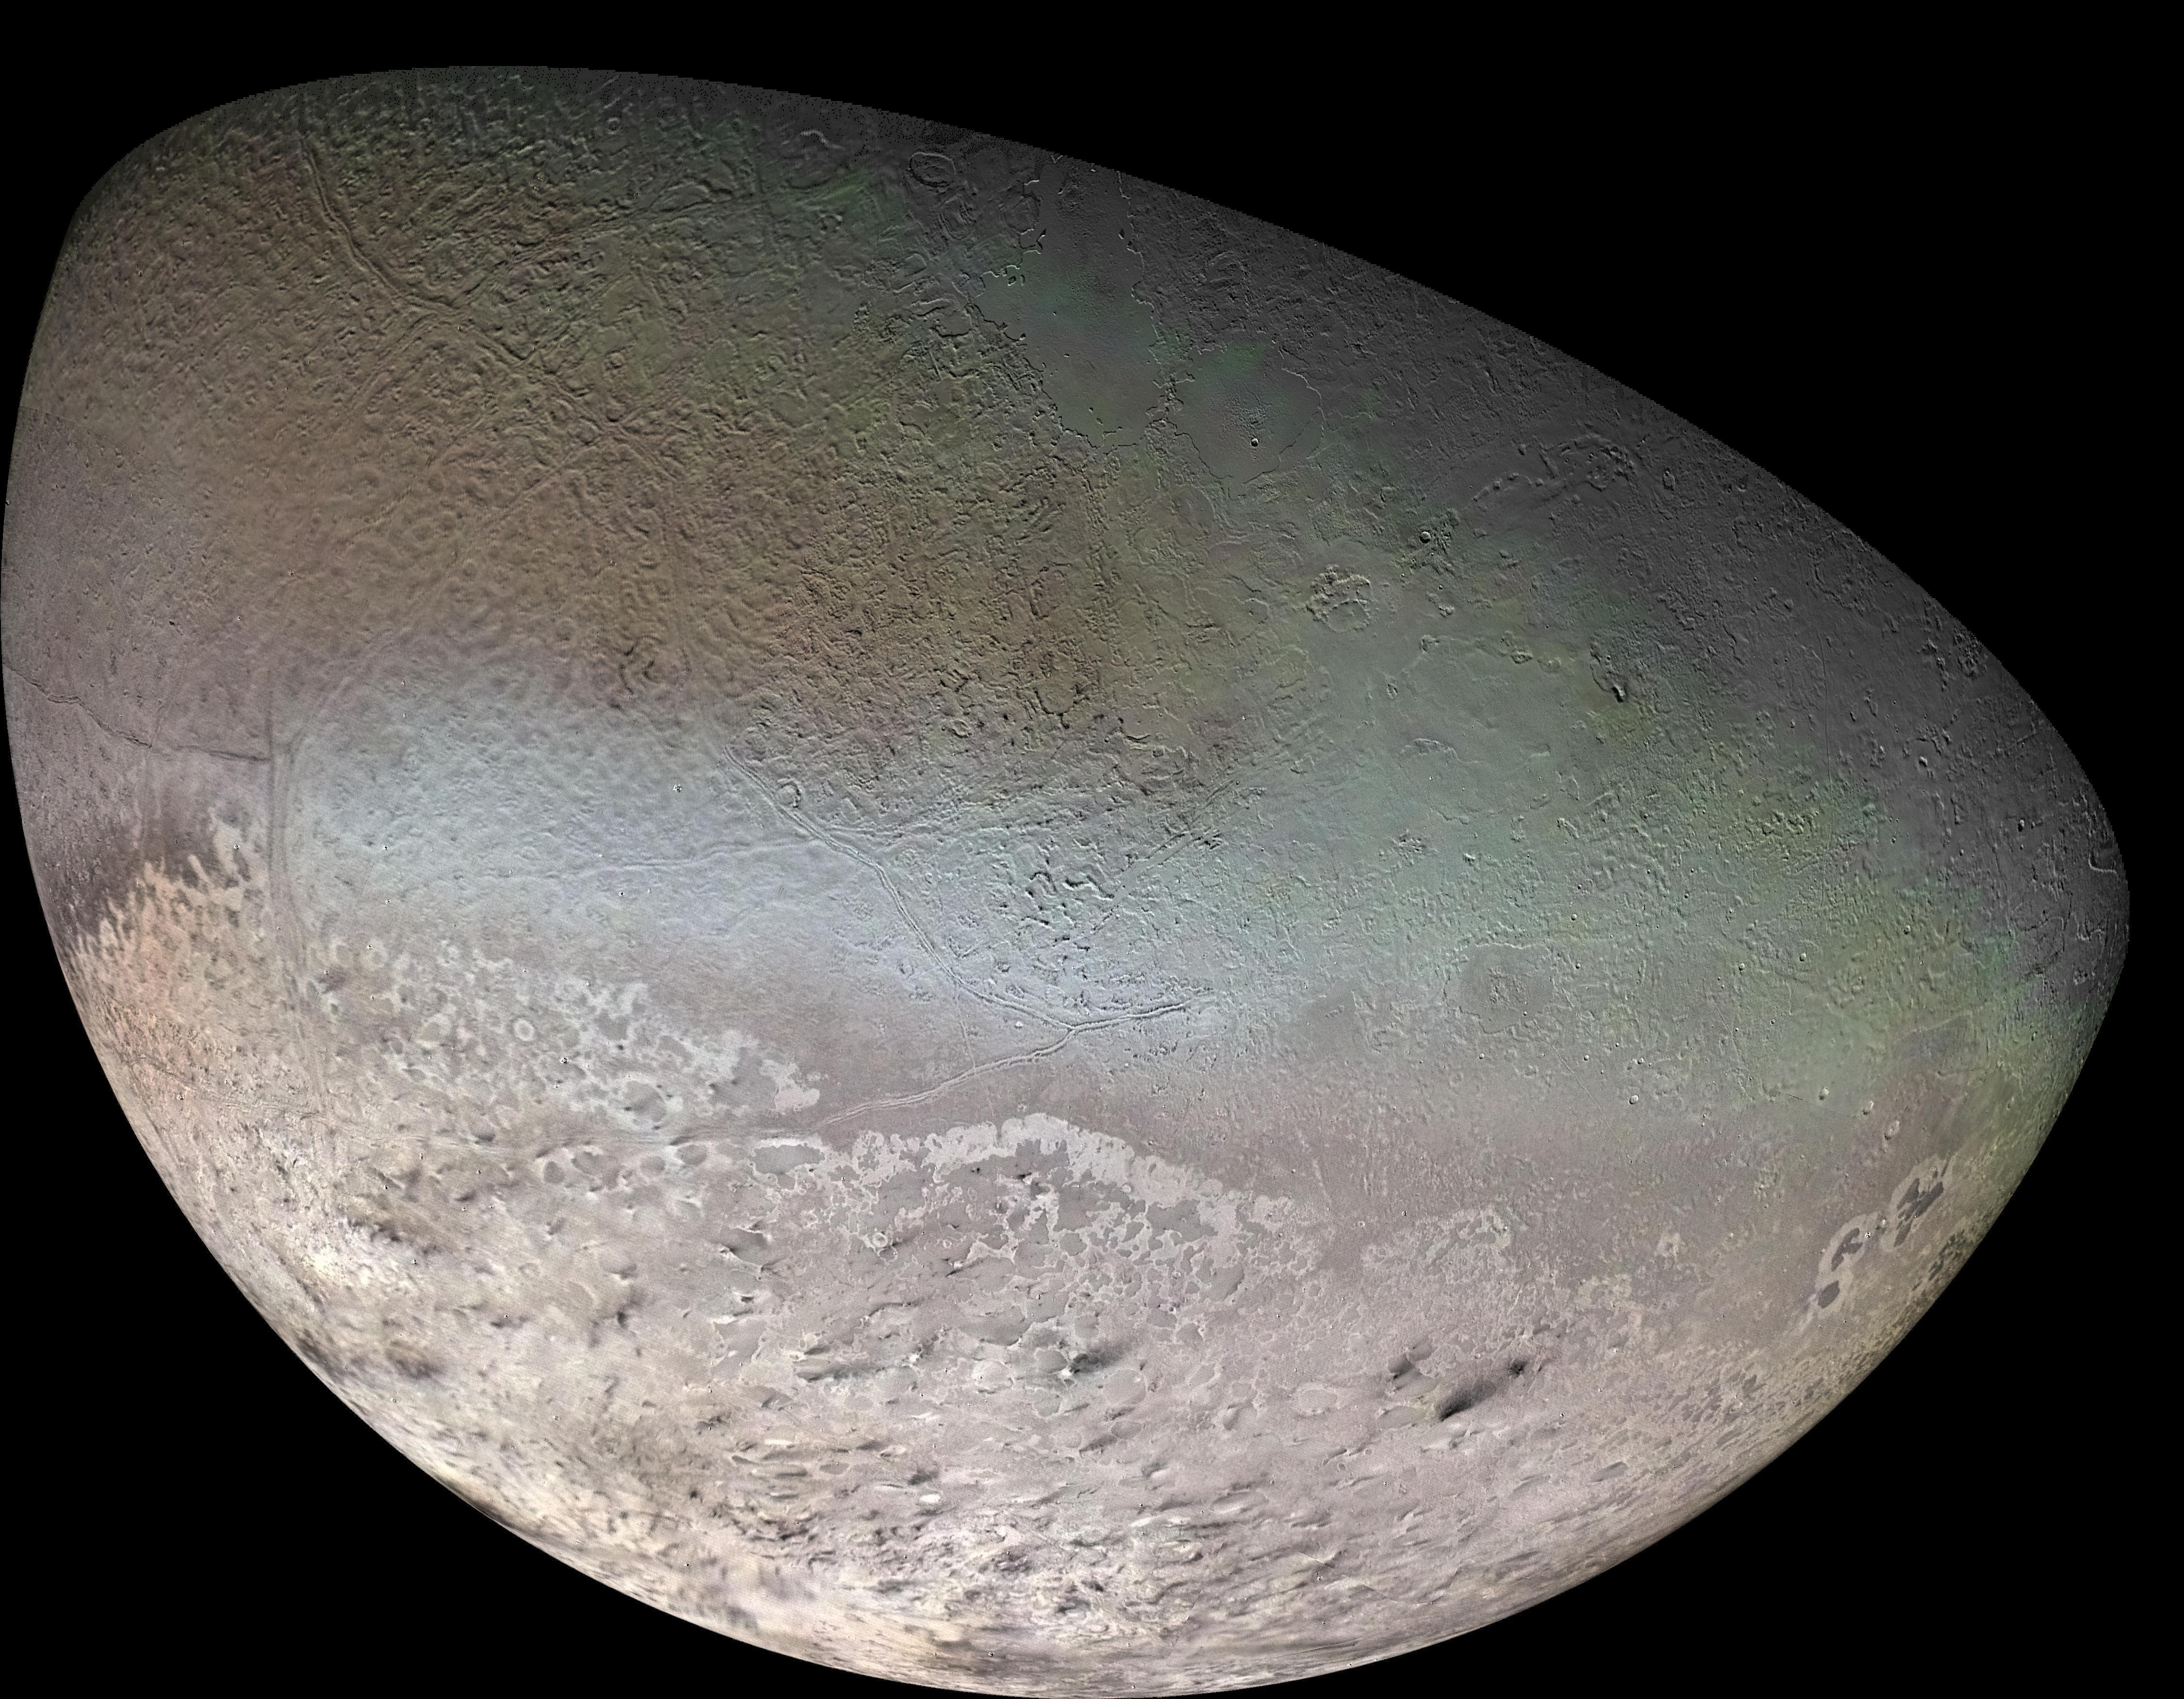 pluto voyager probe - photo #26